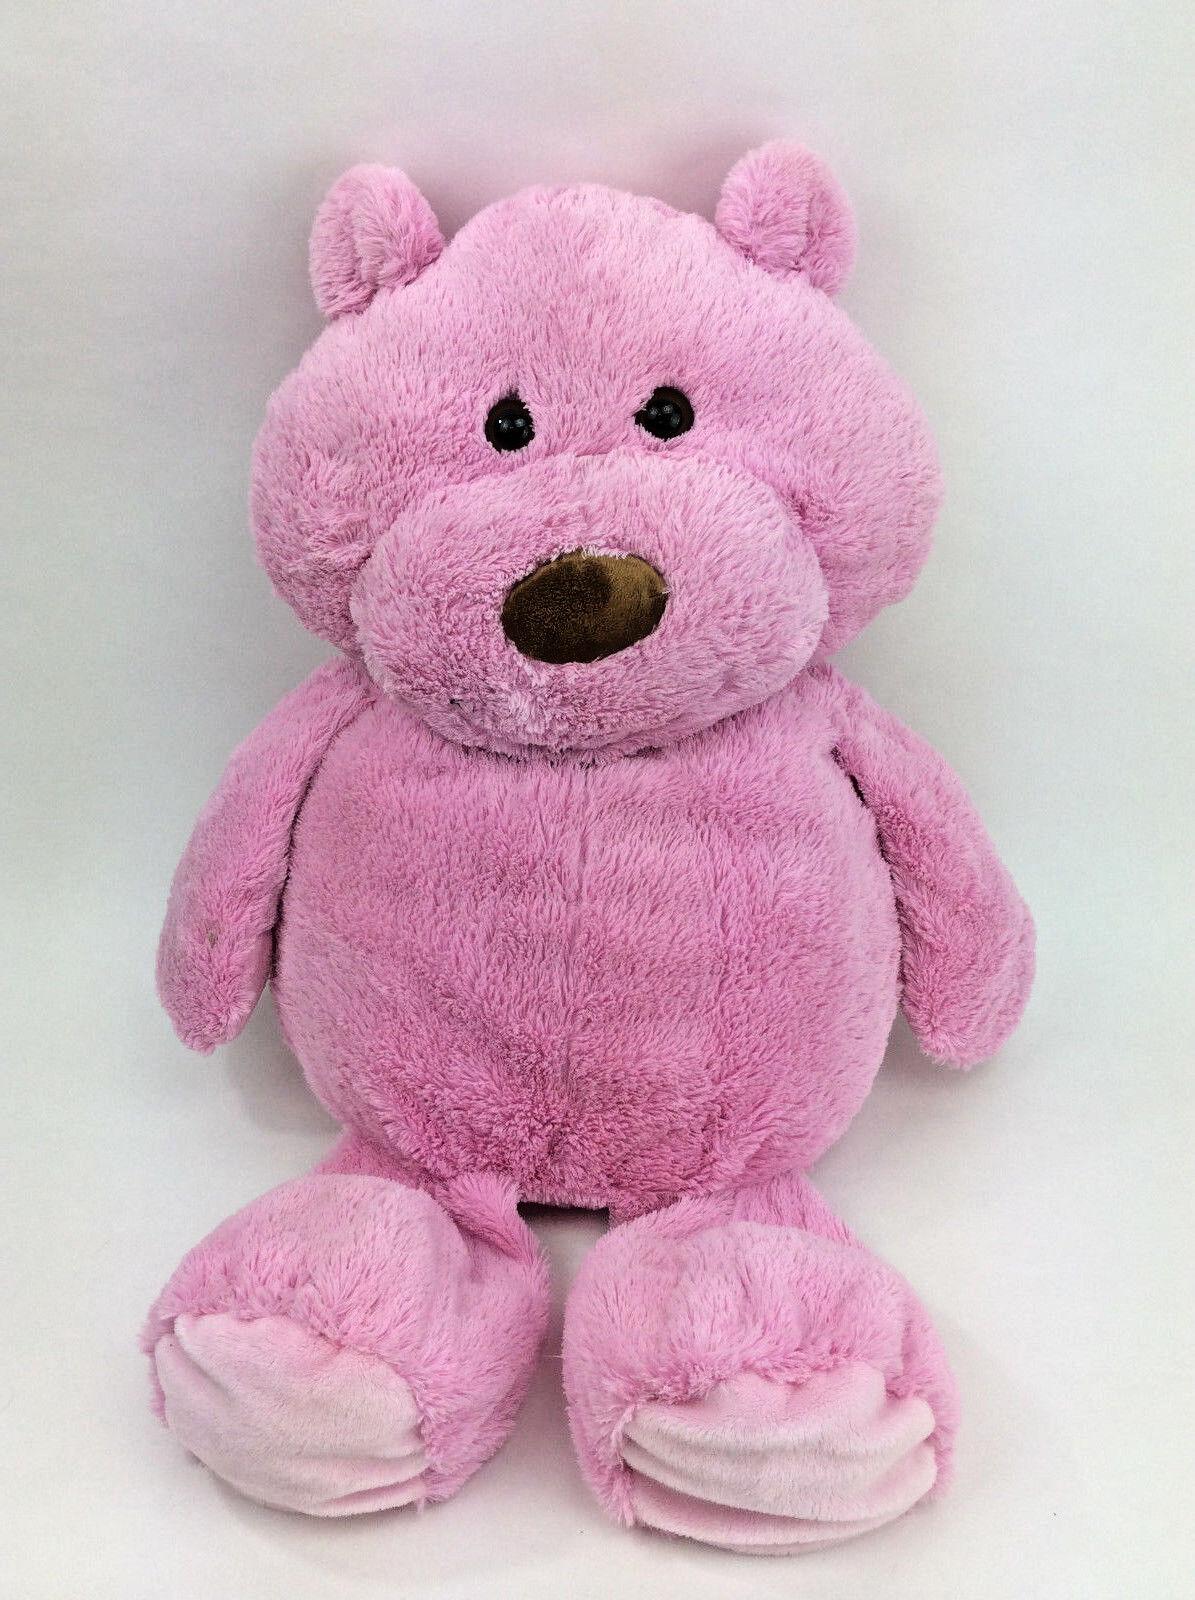 Animal Adventure Teddy Bear Pink JUMBO Plush Stuffed Animal 28